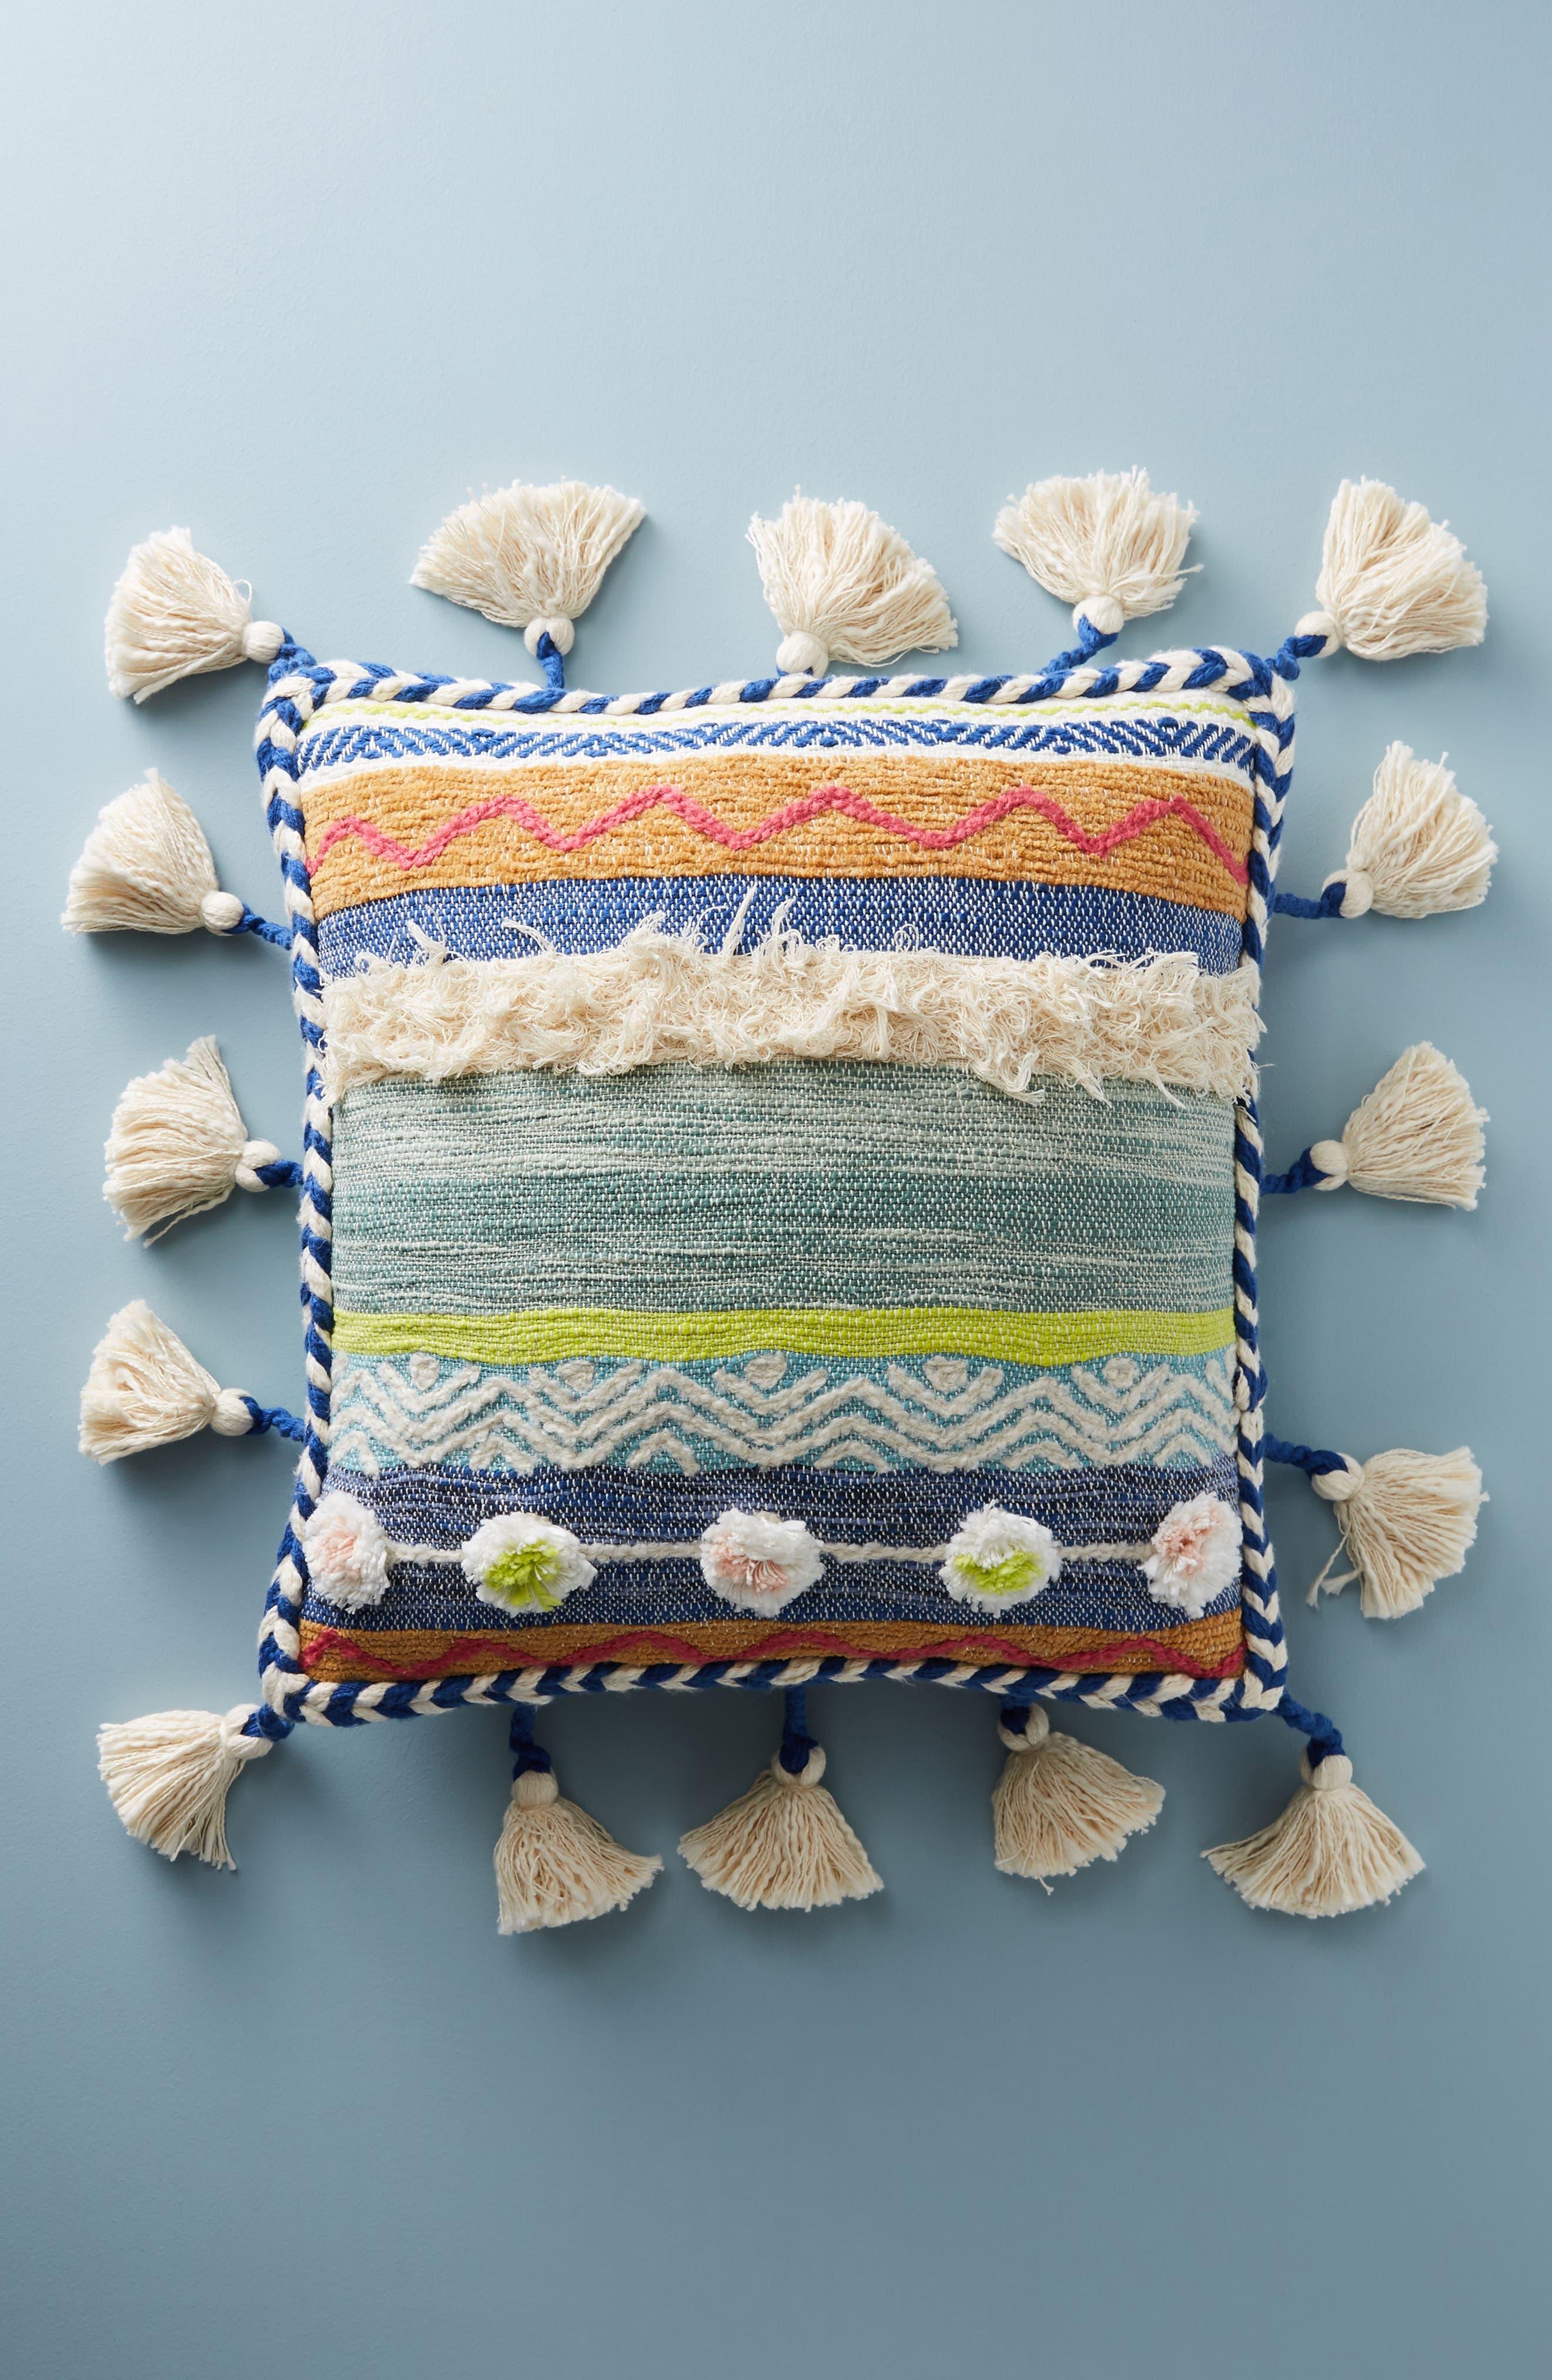 Woven Rami Accent Pillow,                             Main thumbnail 1, color,                             Blue Combo